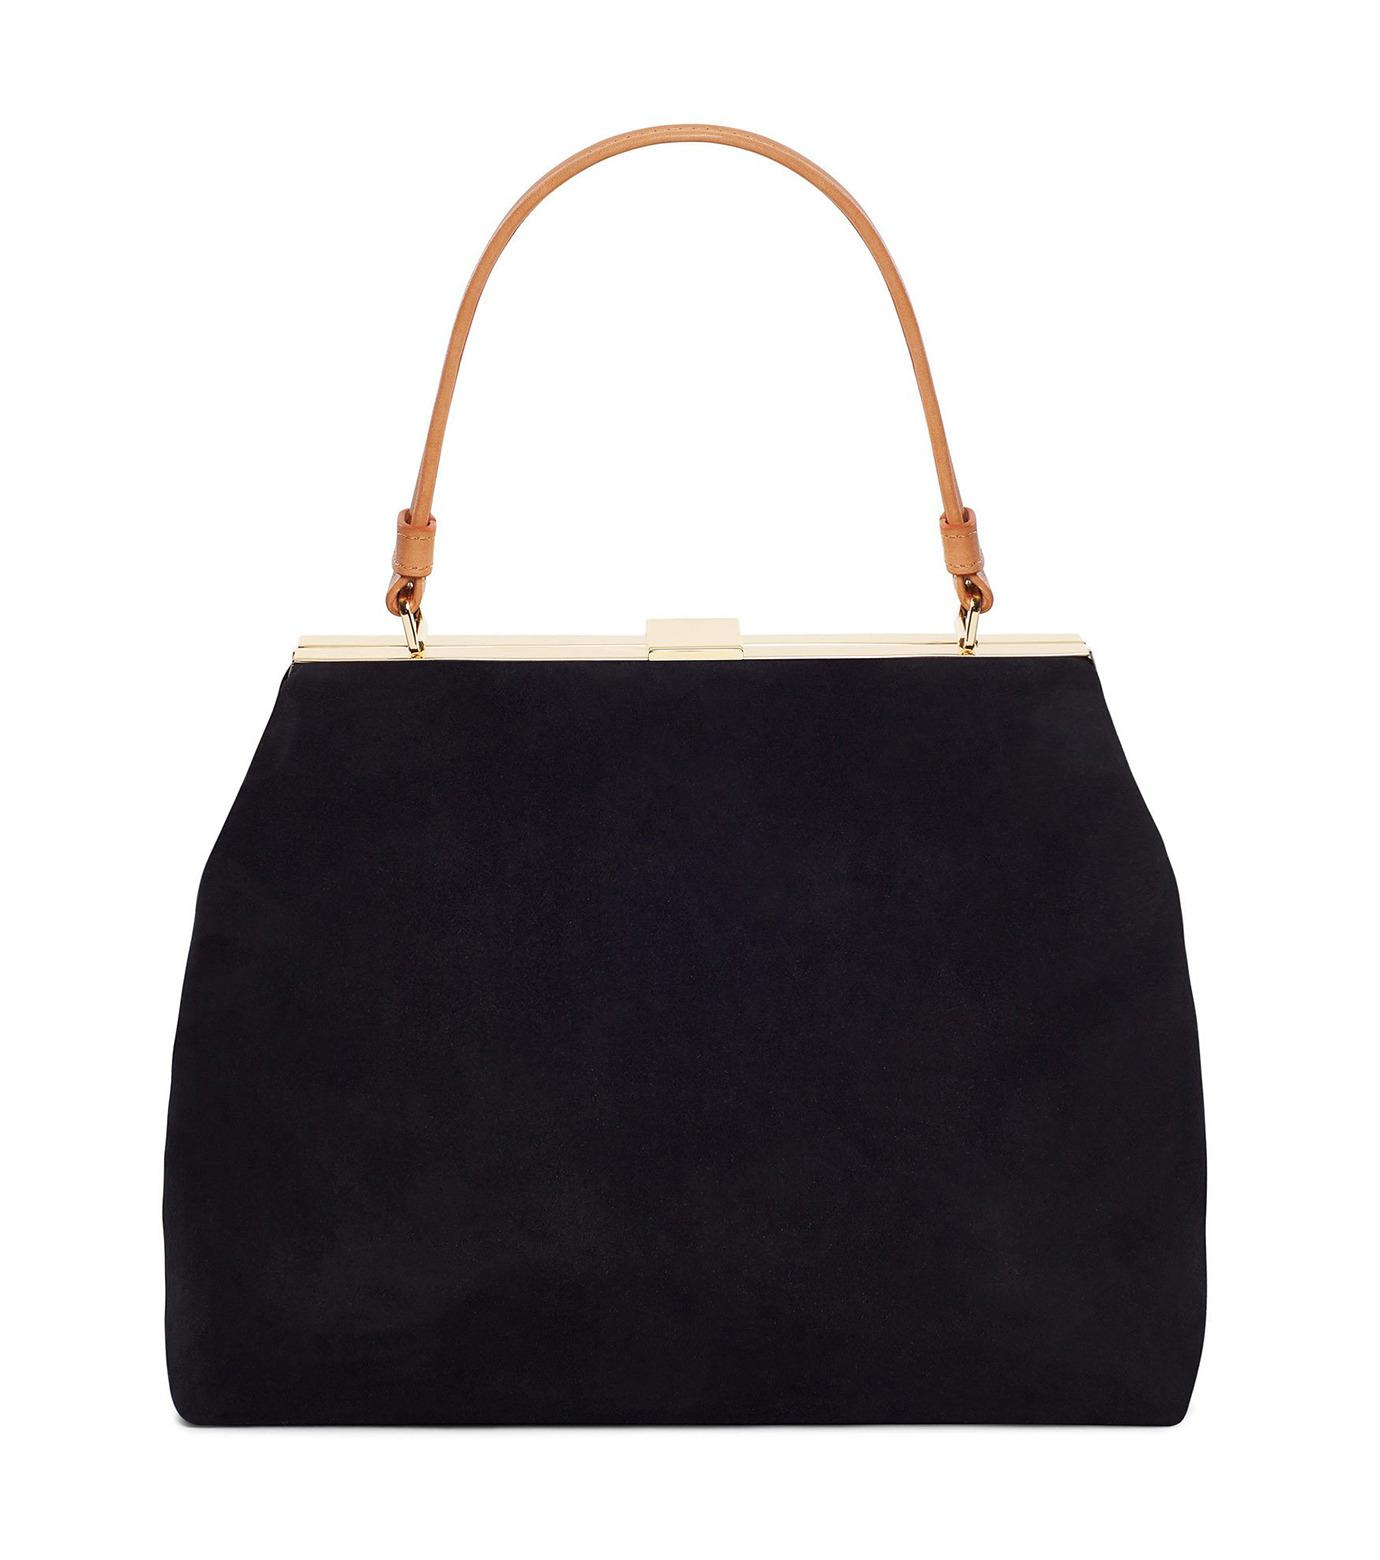 Mansur Gavriel(マンサーガブリエル)のsuede elegant bag-BLACK(ハンドバッグ/hand bag)-HEB024SU-13 拡大詳細画像1